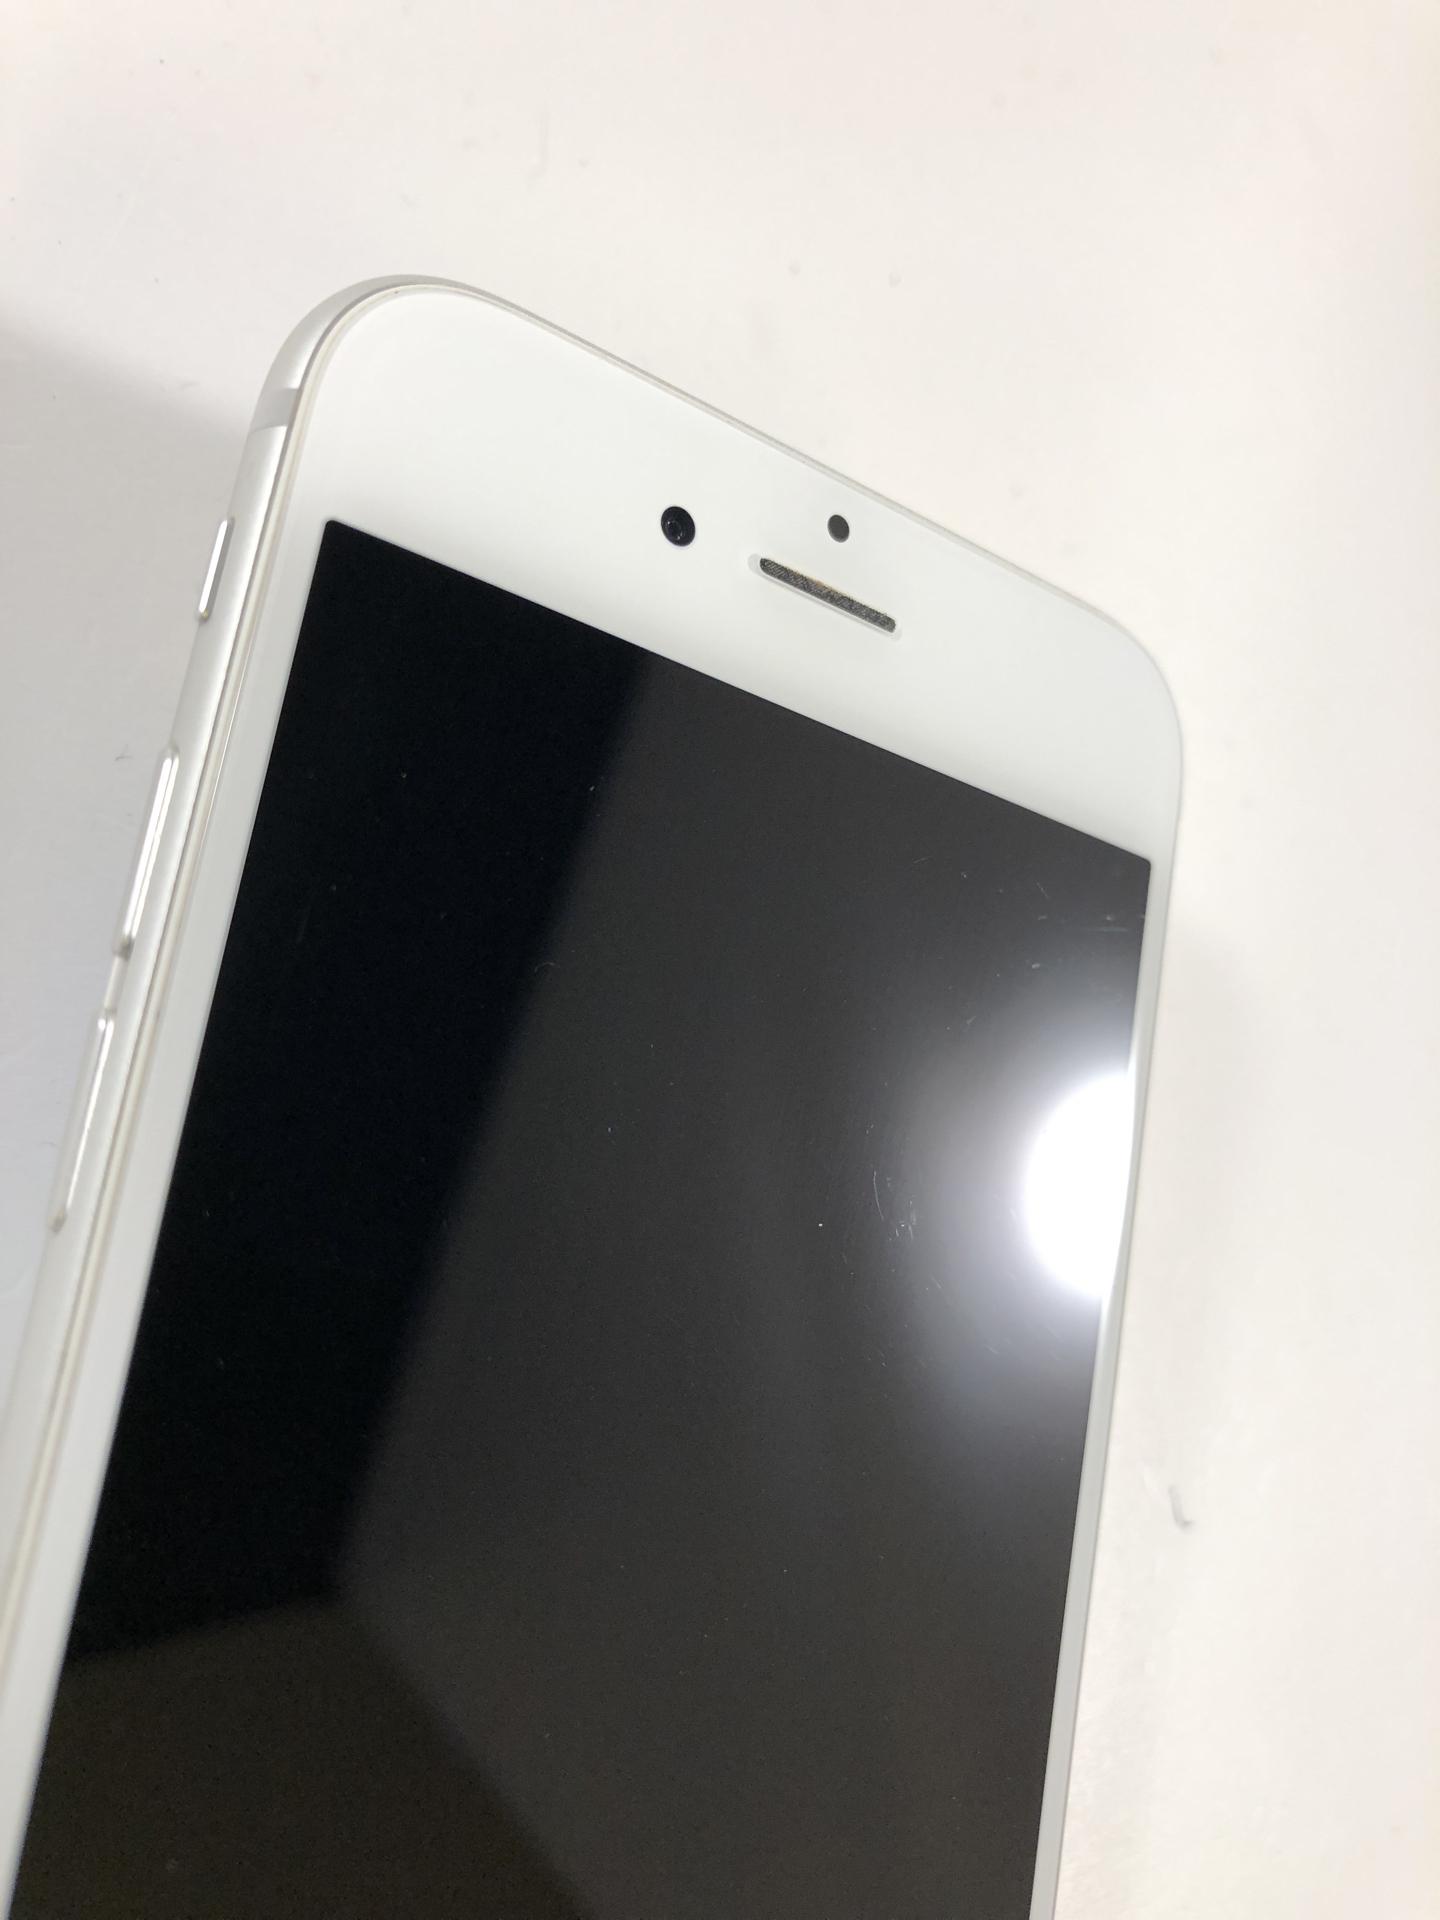 iPhone 6S 16GB, 16GB, Silver, bild 4